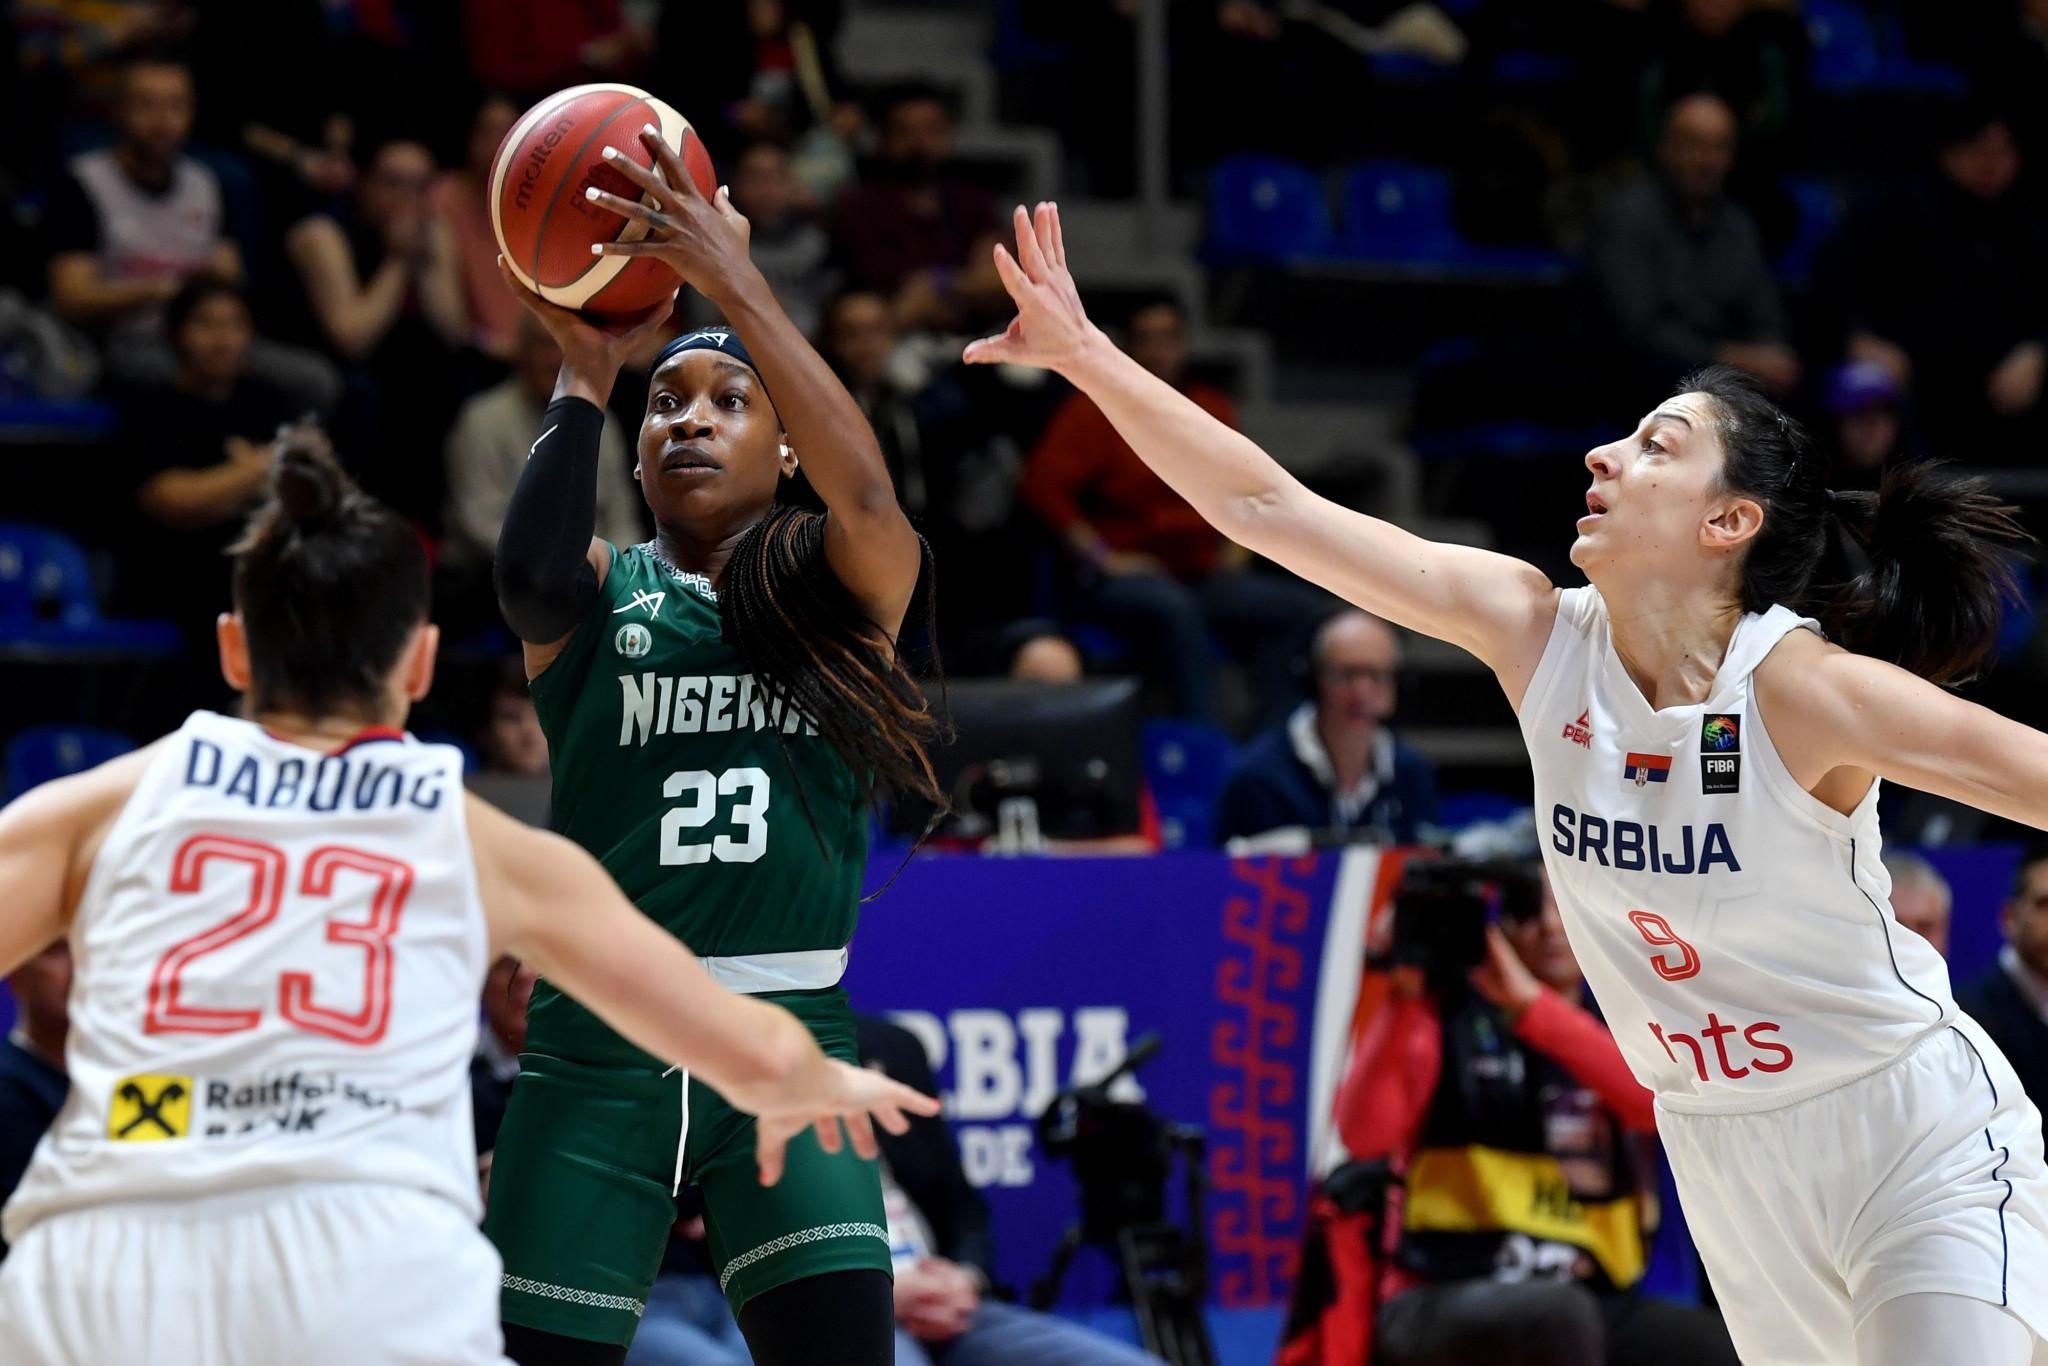 Nigerian Basketball star Ezinne Kalu also runs a cosmetics company ©Getty Images